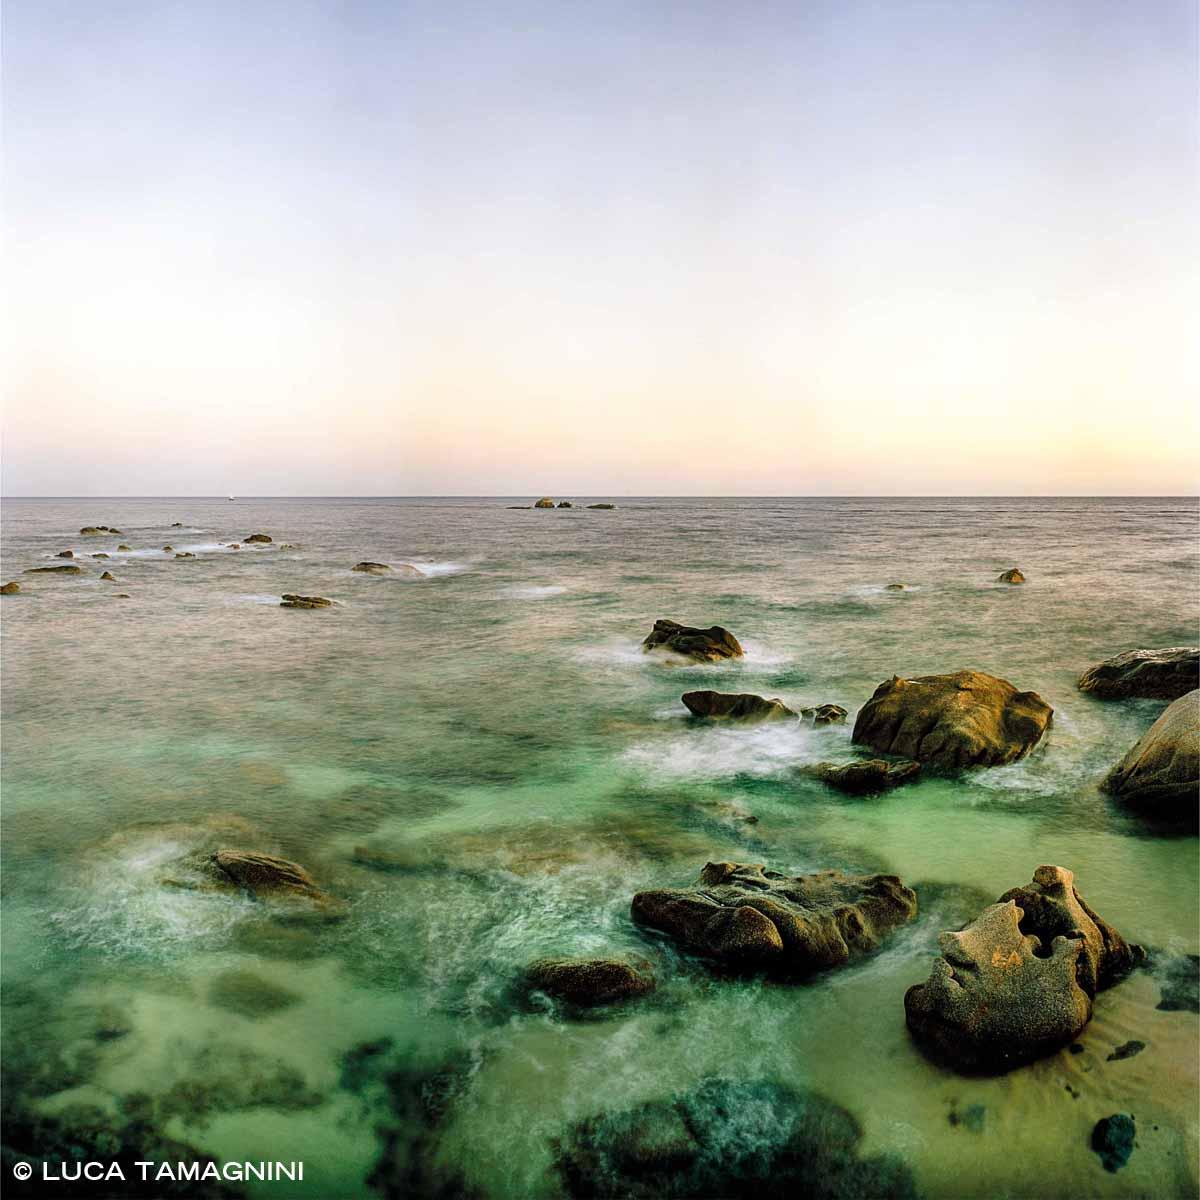 Villasimius, Capo Carbonara, Punta Santo Stefano - Fotografia Fine Art di Luca Tamagnini - Formato 100 x 100 cm - Catalogo 2011-001